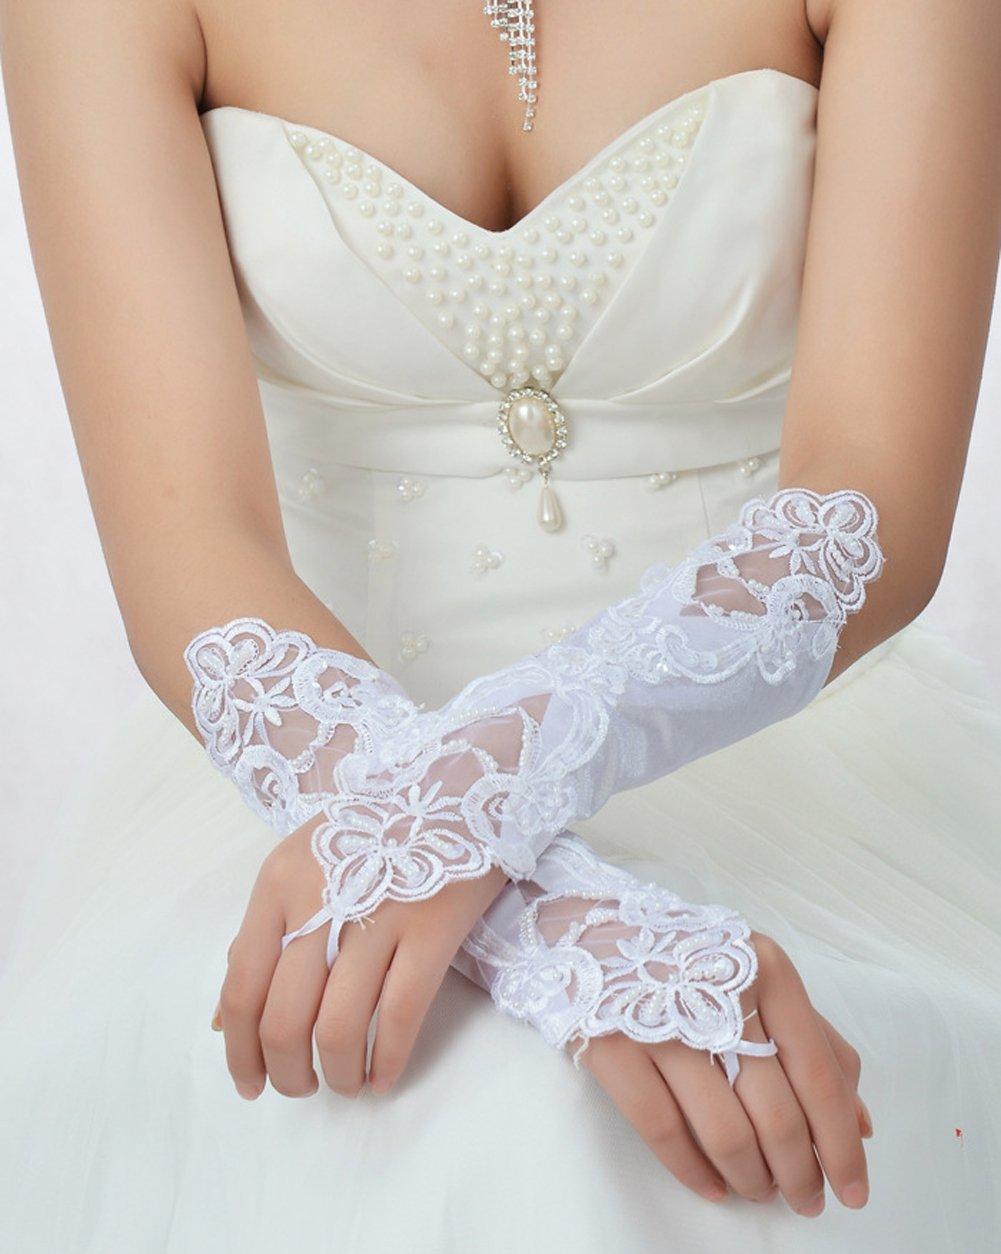 Hosaire Coppia di Gothic donna guanti pizzo matrimonio sposa Tarde Guanti Bianco Satin El/égant Mascarada Maschera per Venezia tuta Fiesta bianco Guantes bianco